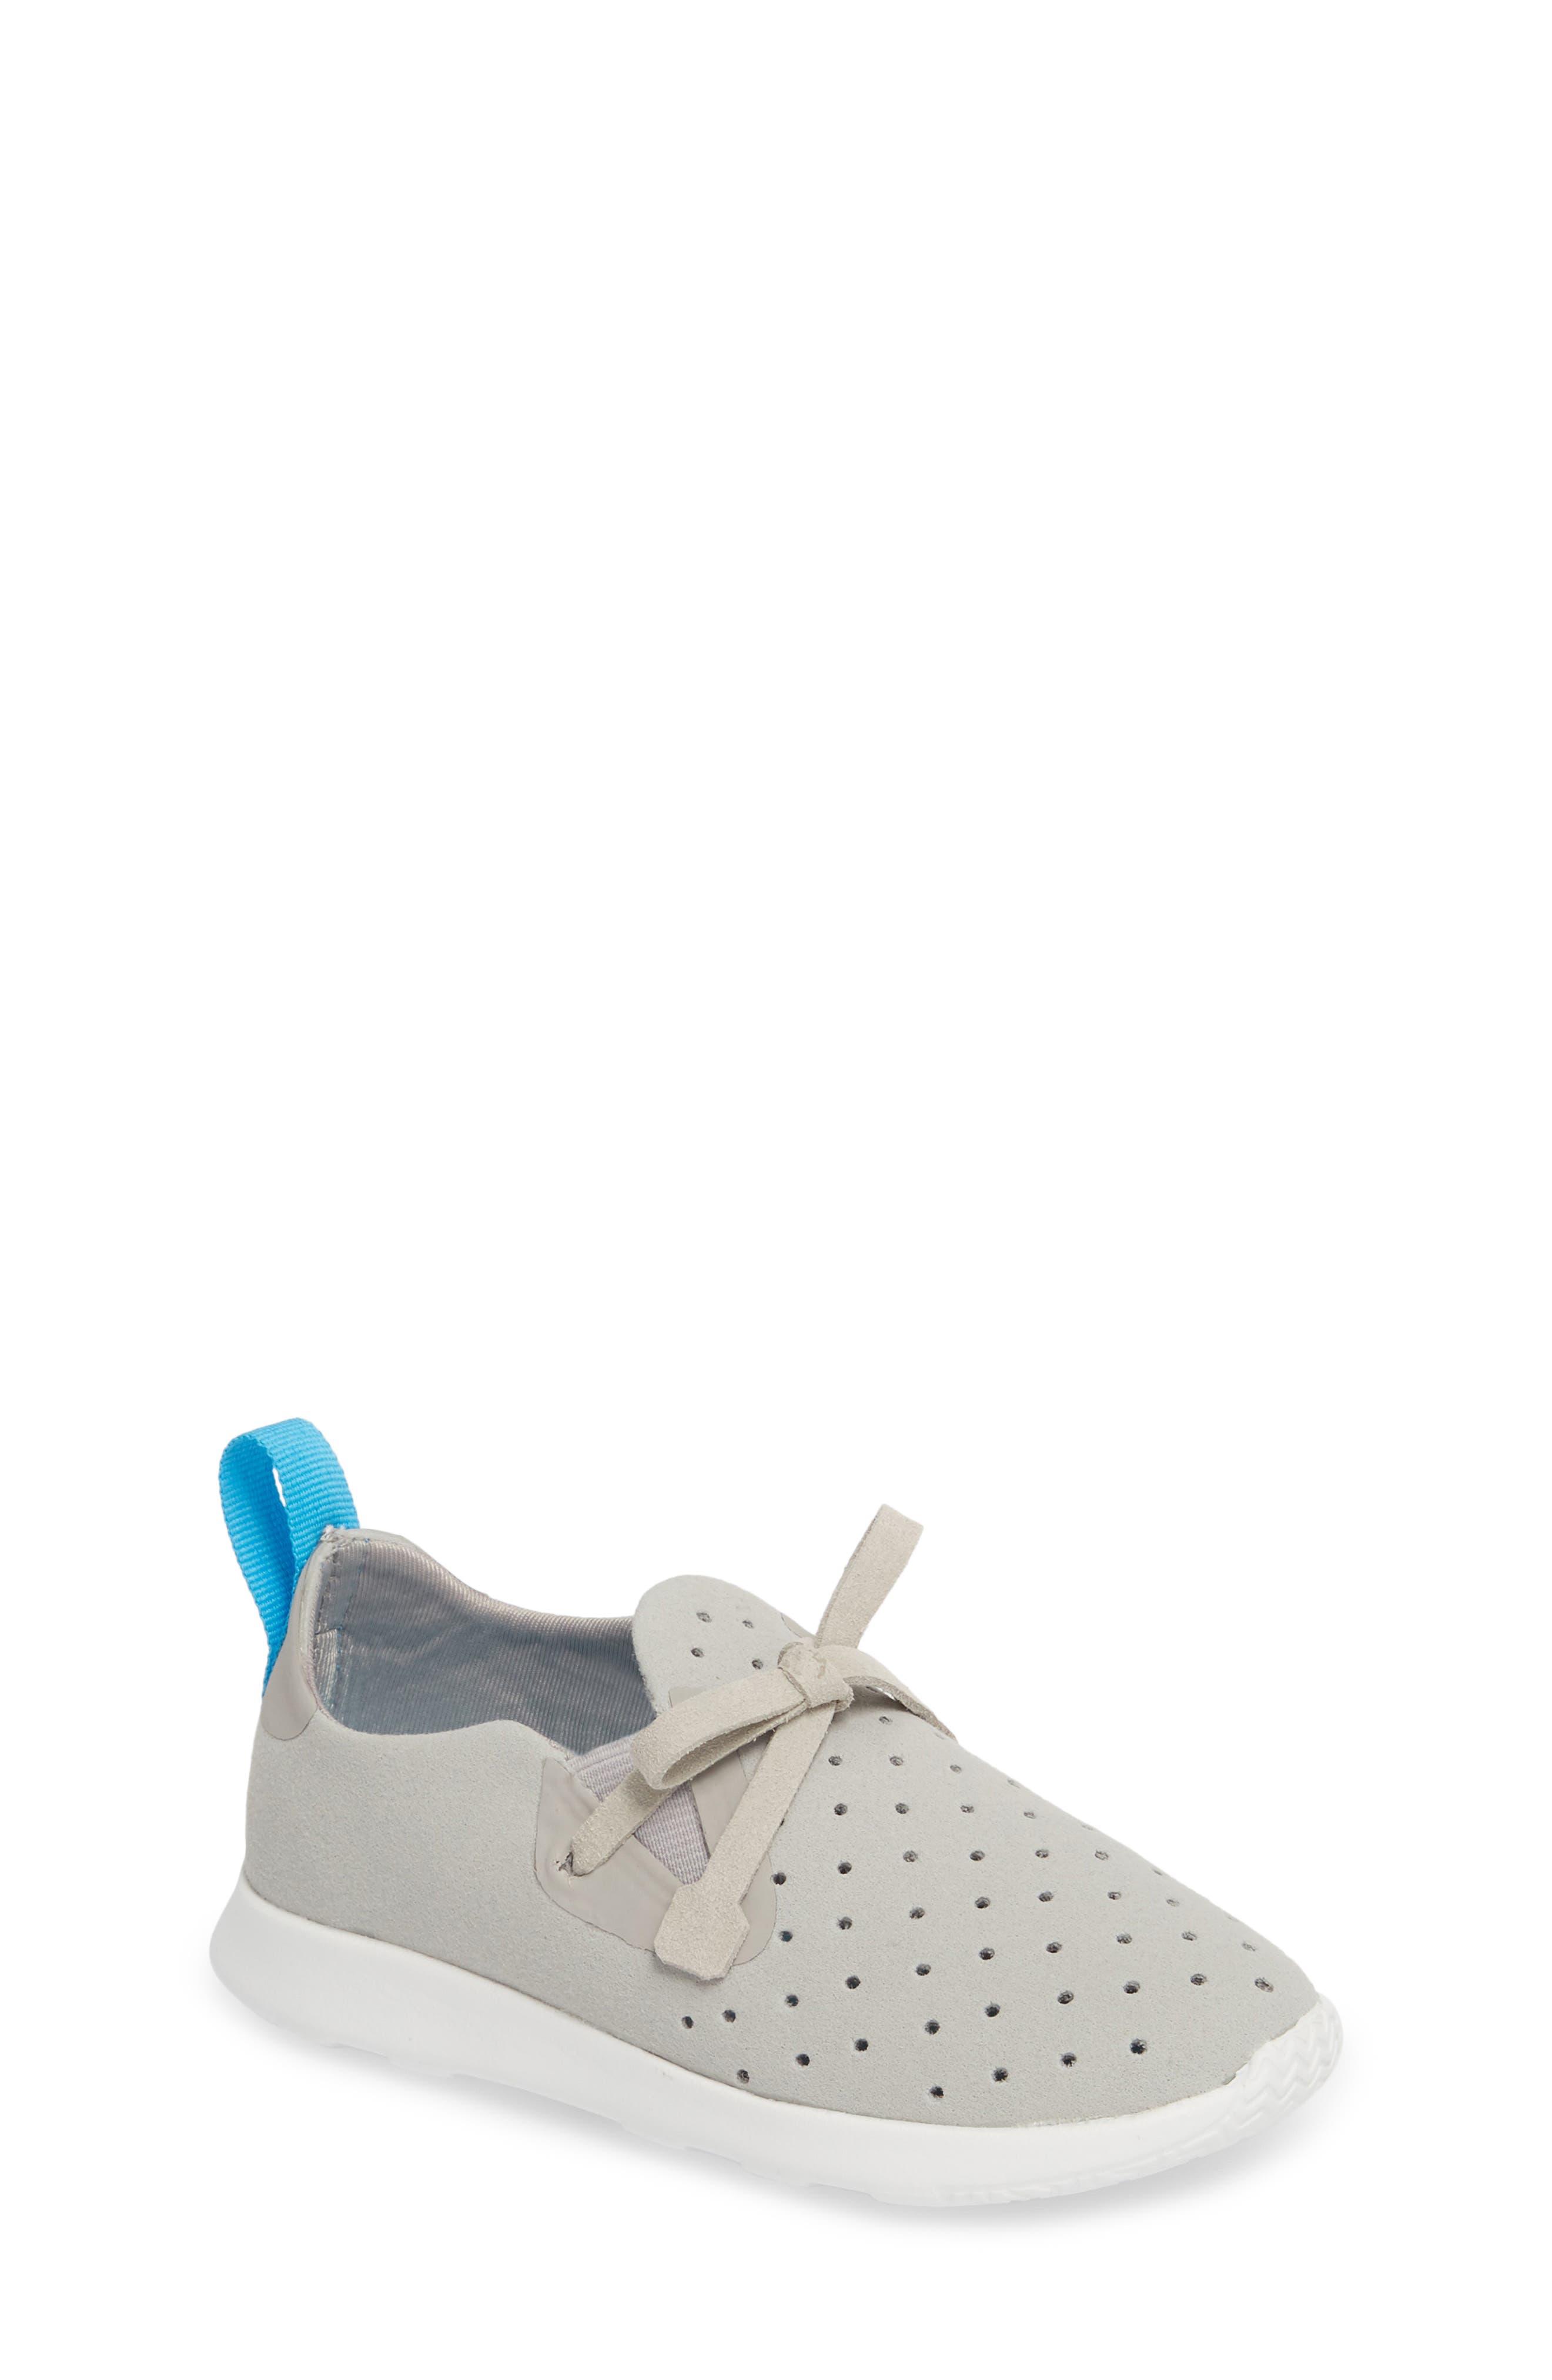 Native Shoes AP Moc Perforated Washable Sneaker (Walker, Toddler, Little Kid & Big Kid)